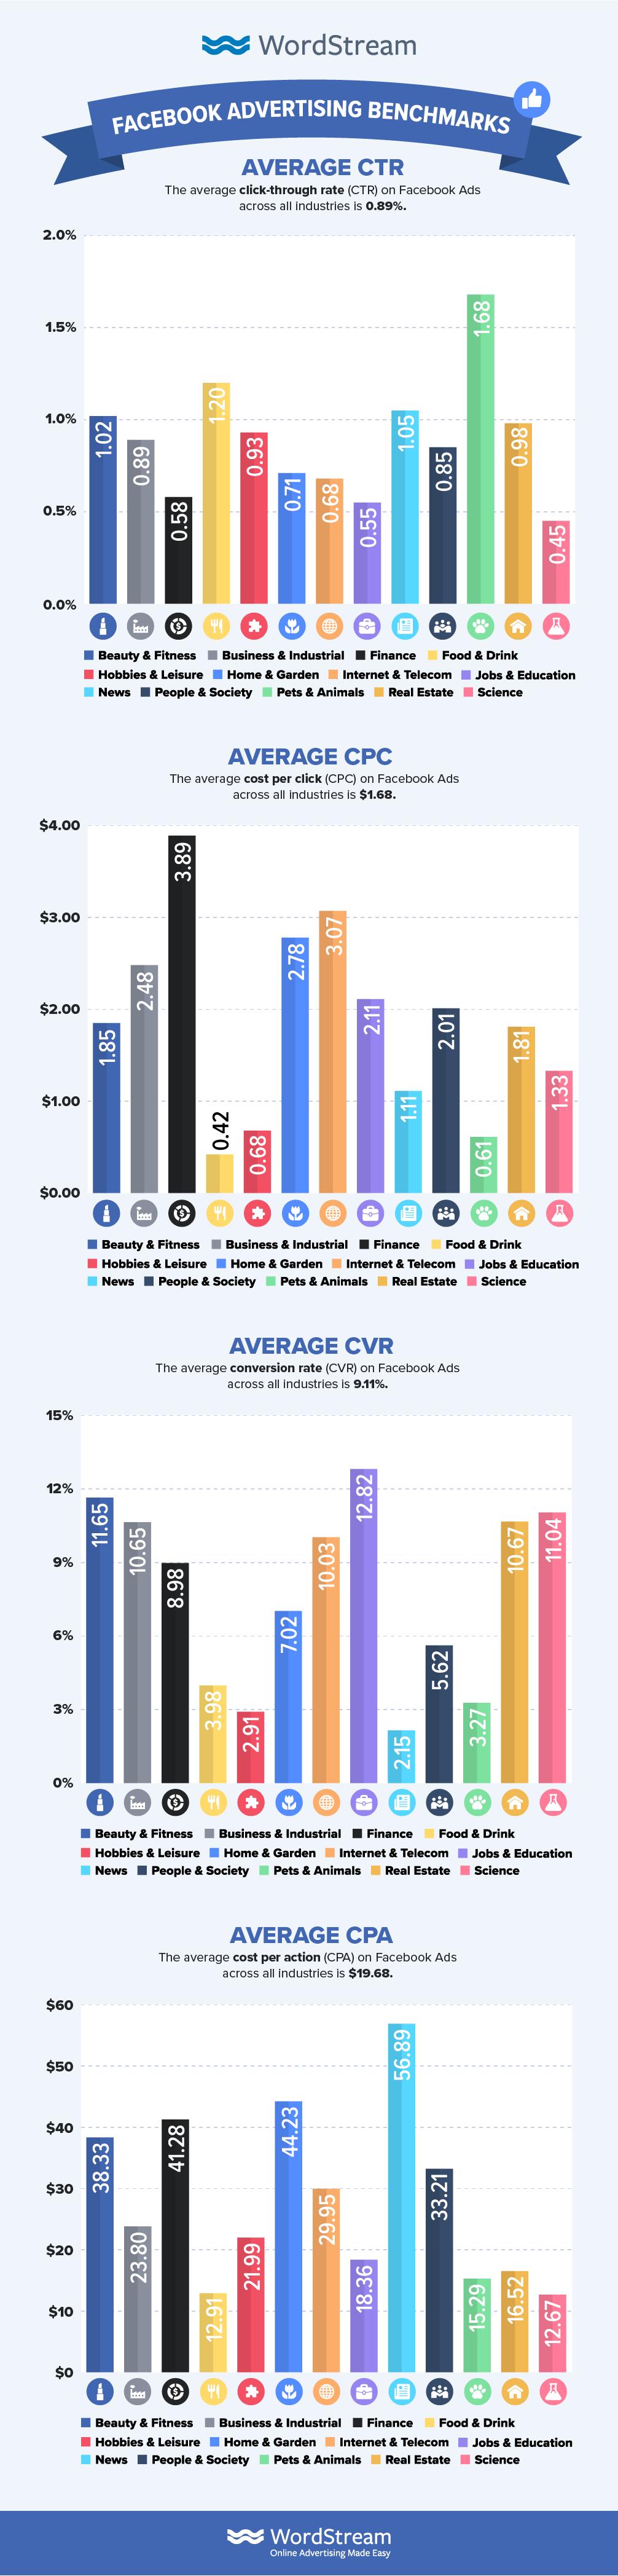 facebook industry benchmarks